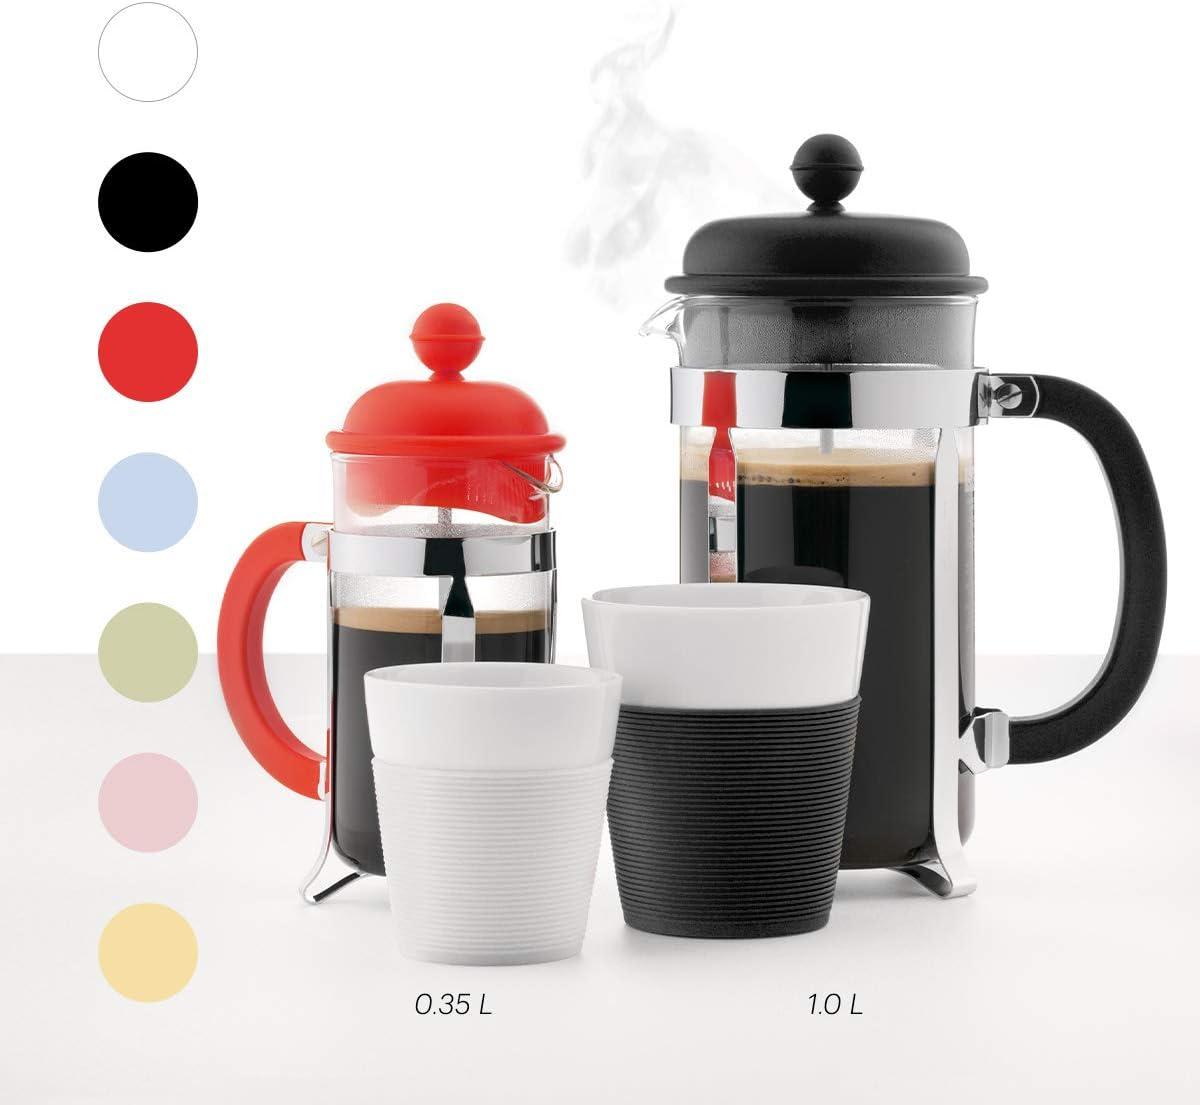 Bodum K11872-10TR Set de filtro de caf/é individual y taza t/érmica de pl/ástico de doble pared 0,35 literas